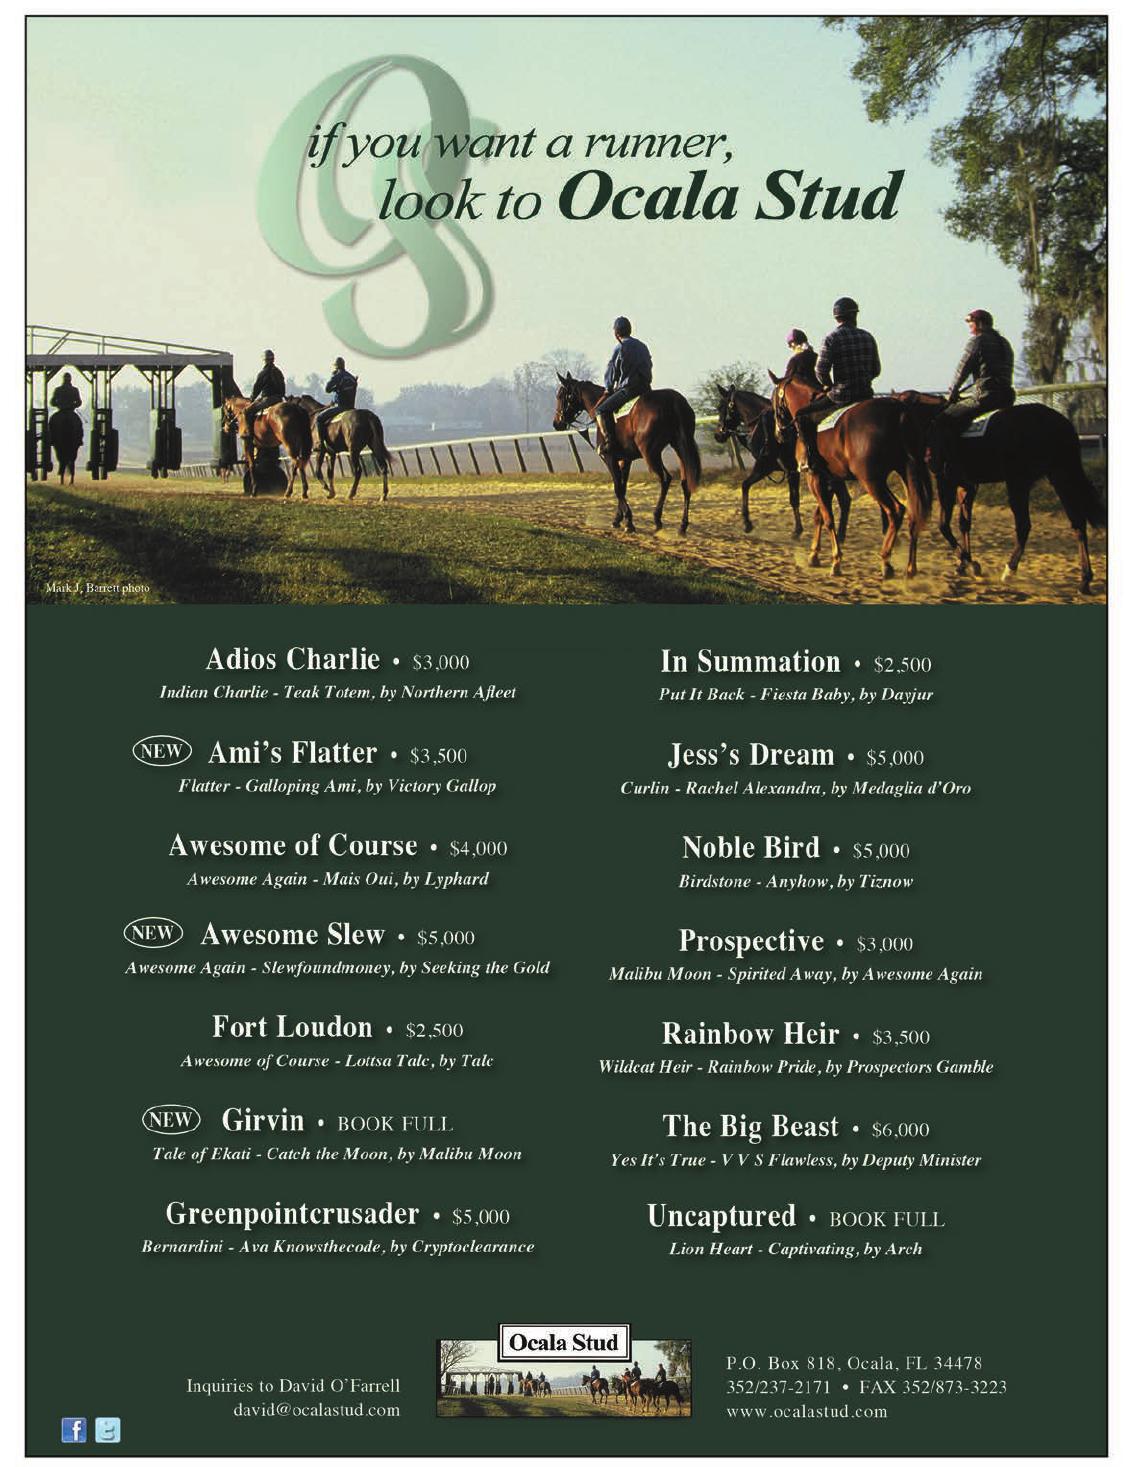 BY BROCK SHERIDAN Ocala Breeders' Sales Company beg